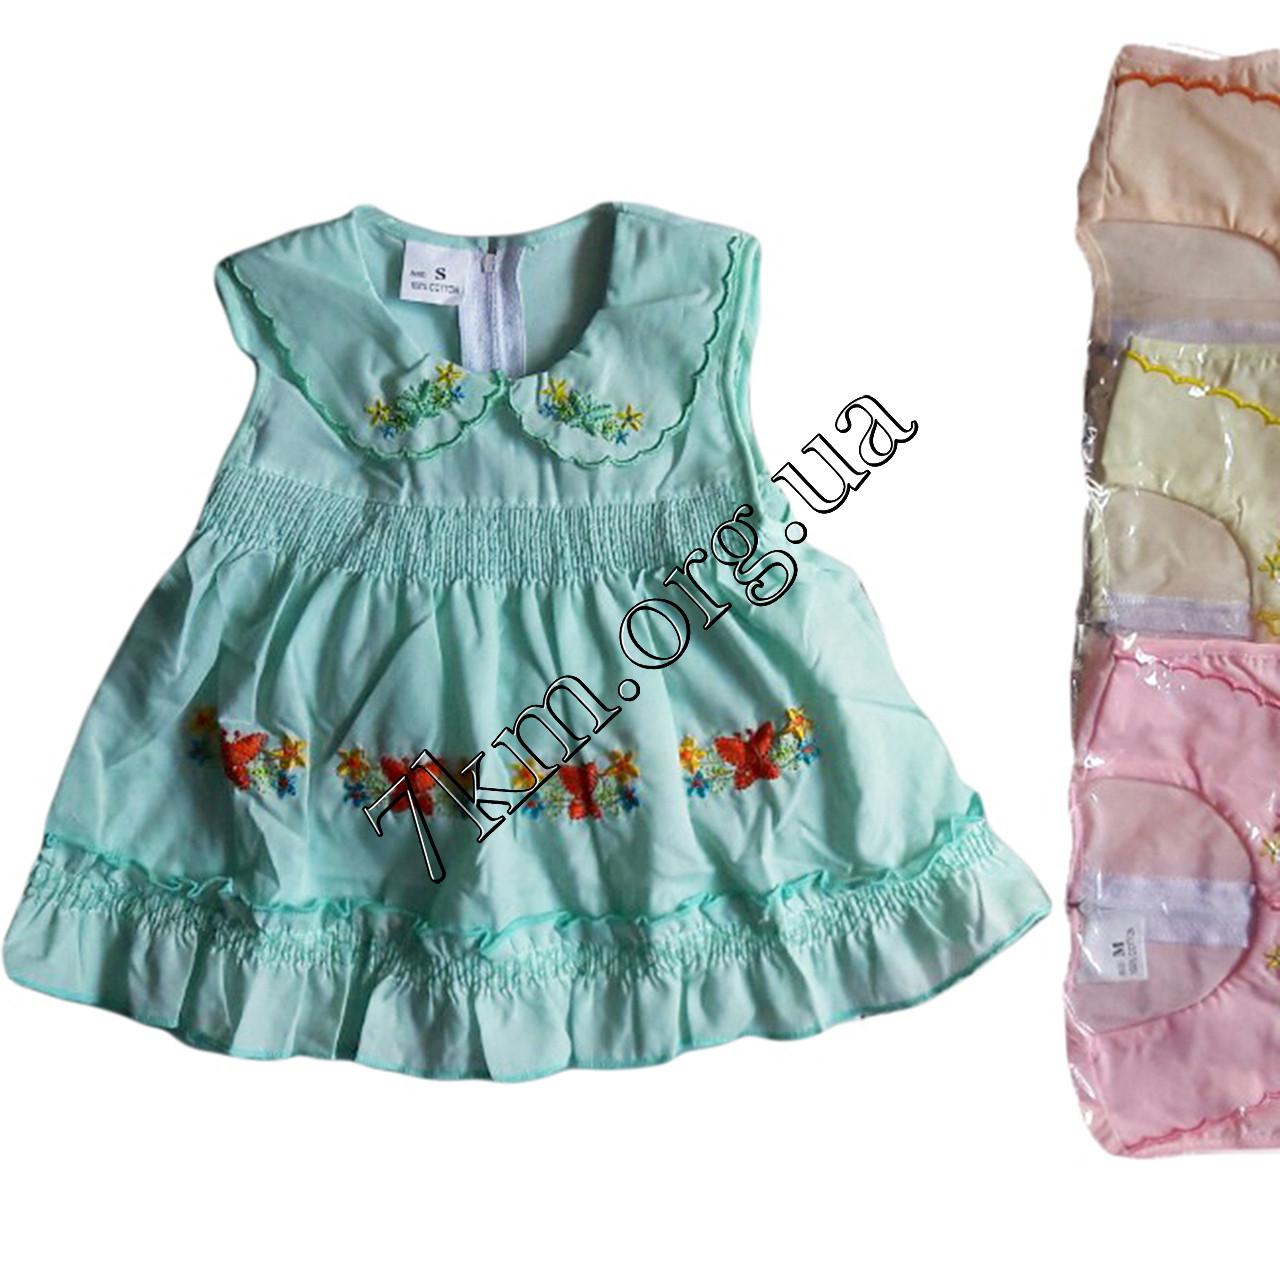 Платье с трусиками батист 6-18 месяцев Оптом 020534